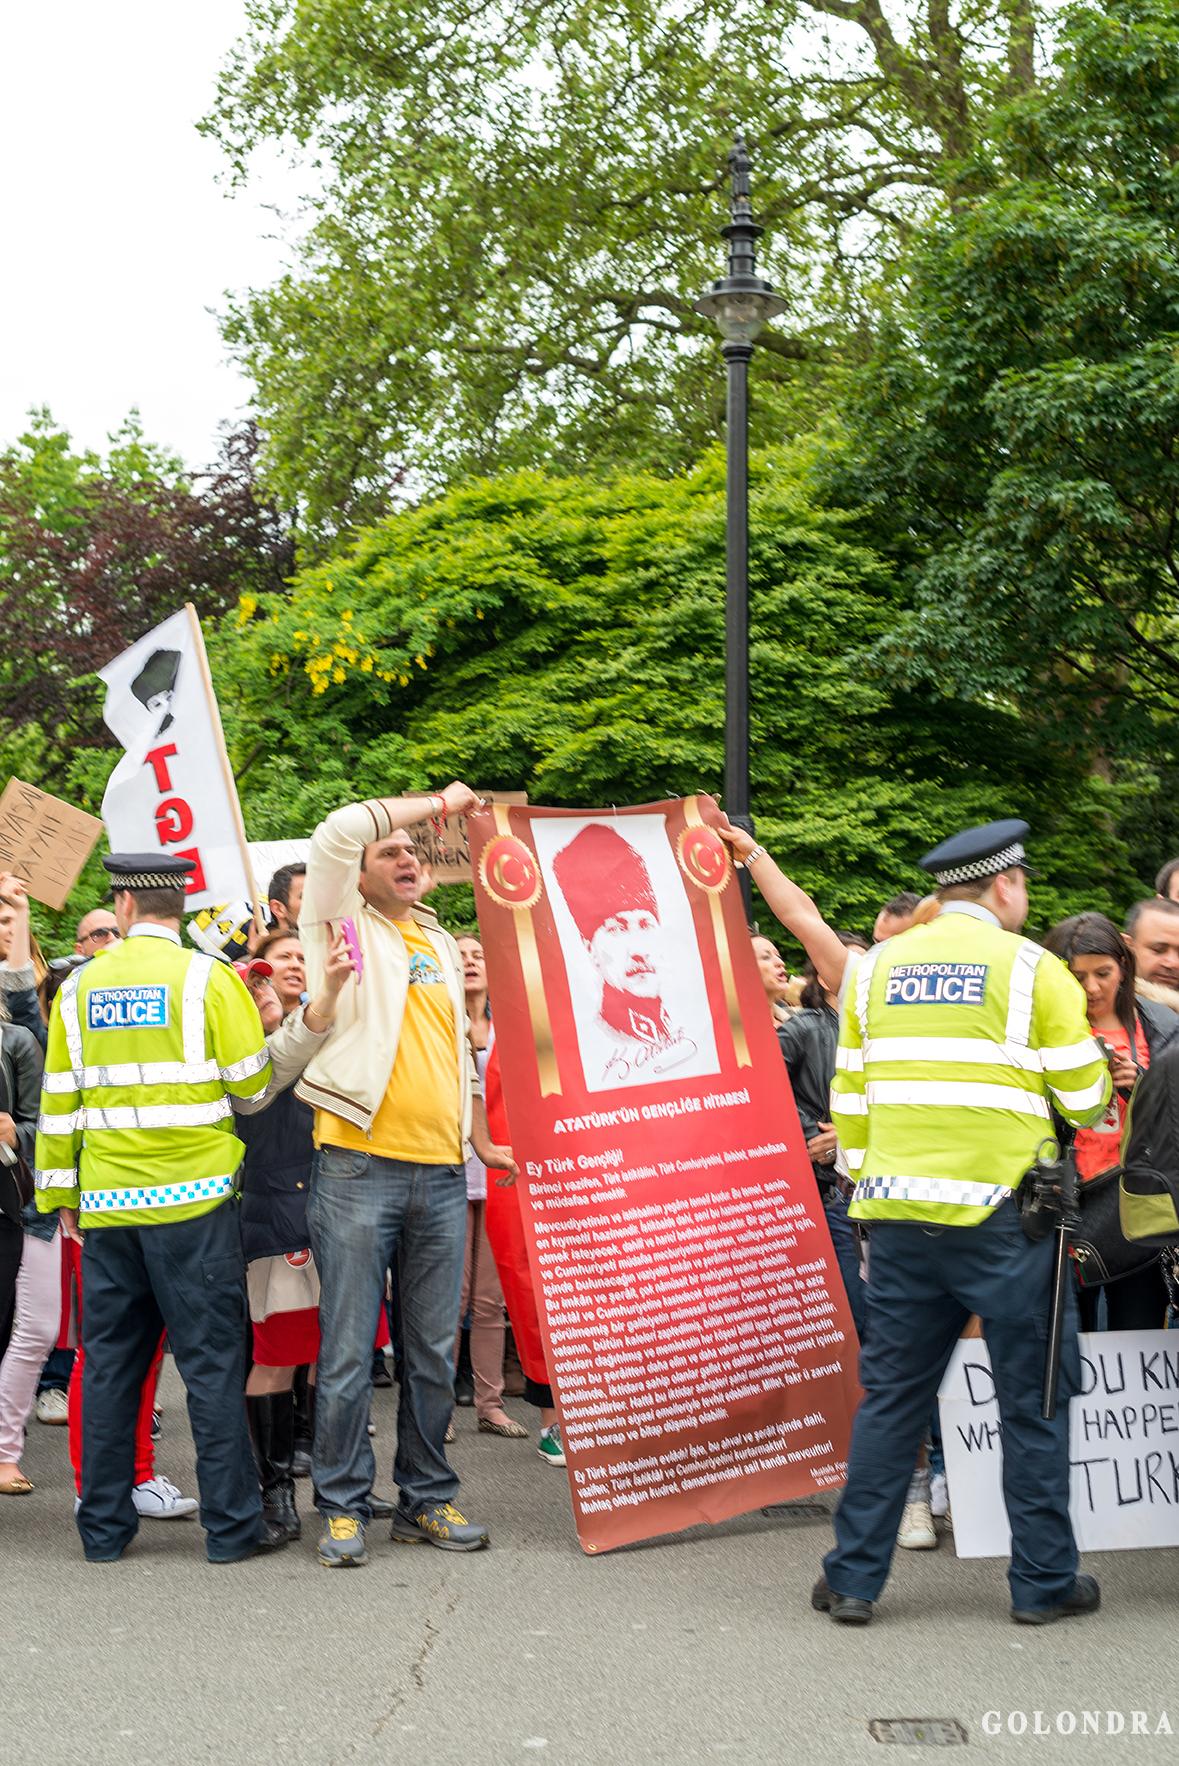 Protesting Turkish Government - Turk Hukumetini Protesto - Londra - London (46)